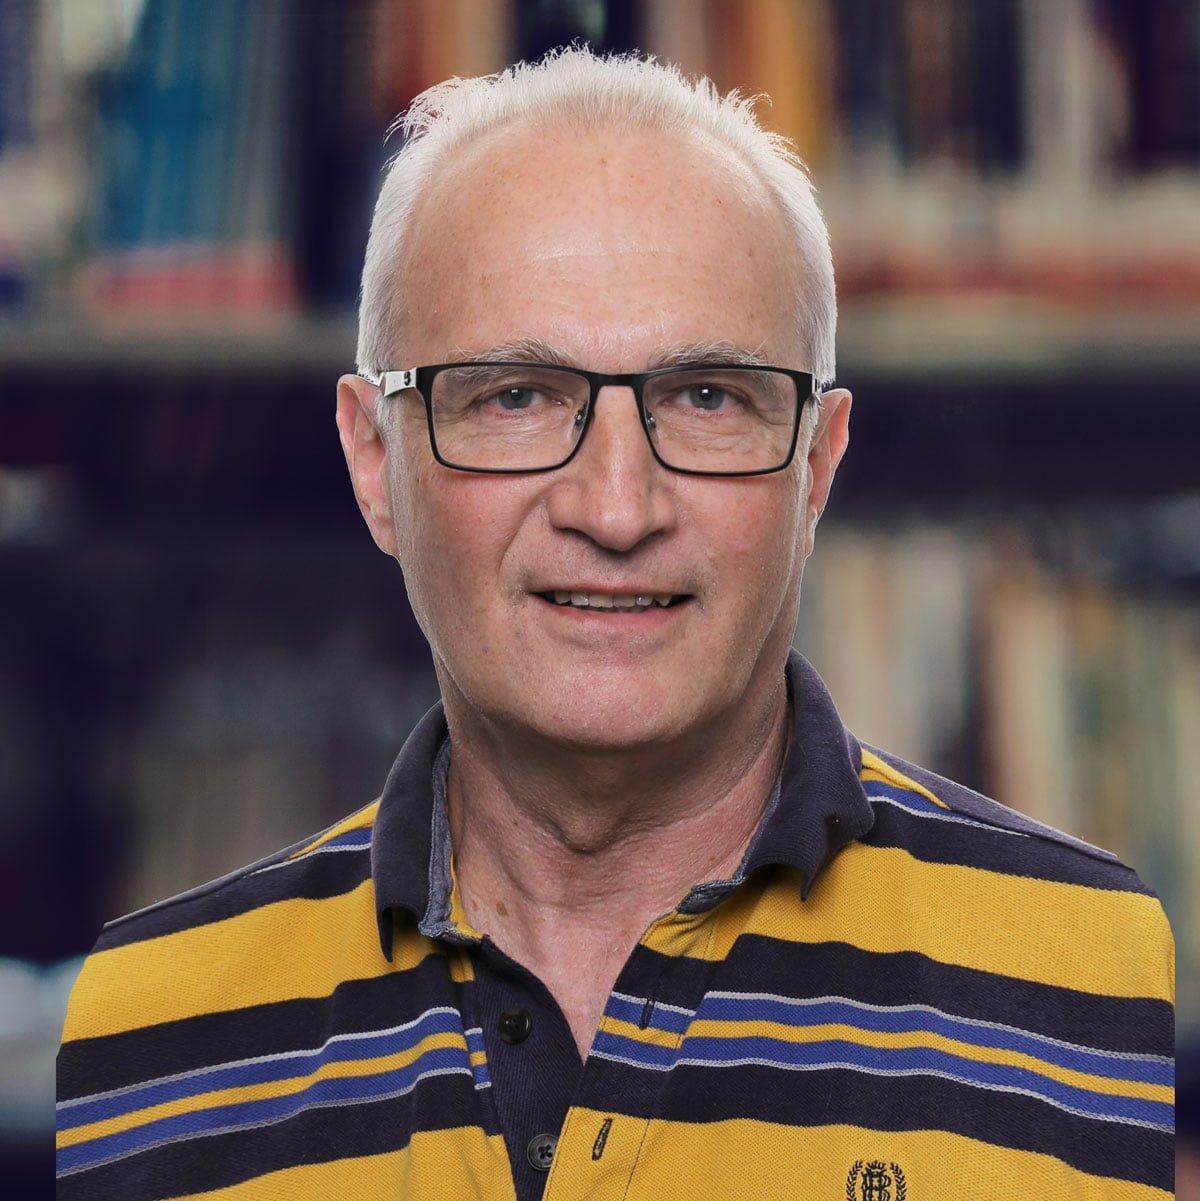 Peter Hjortsten